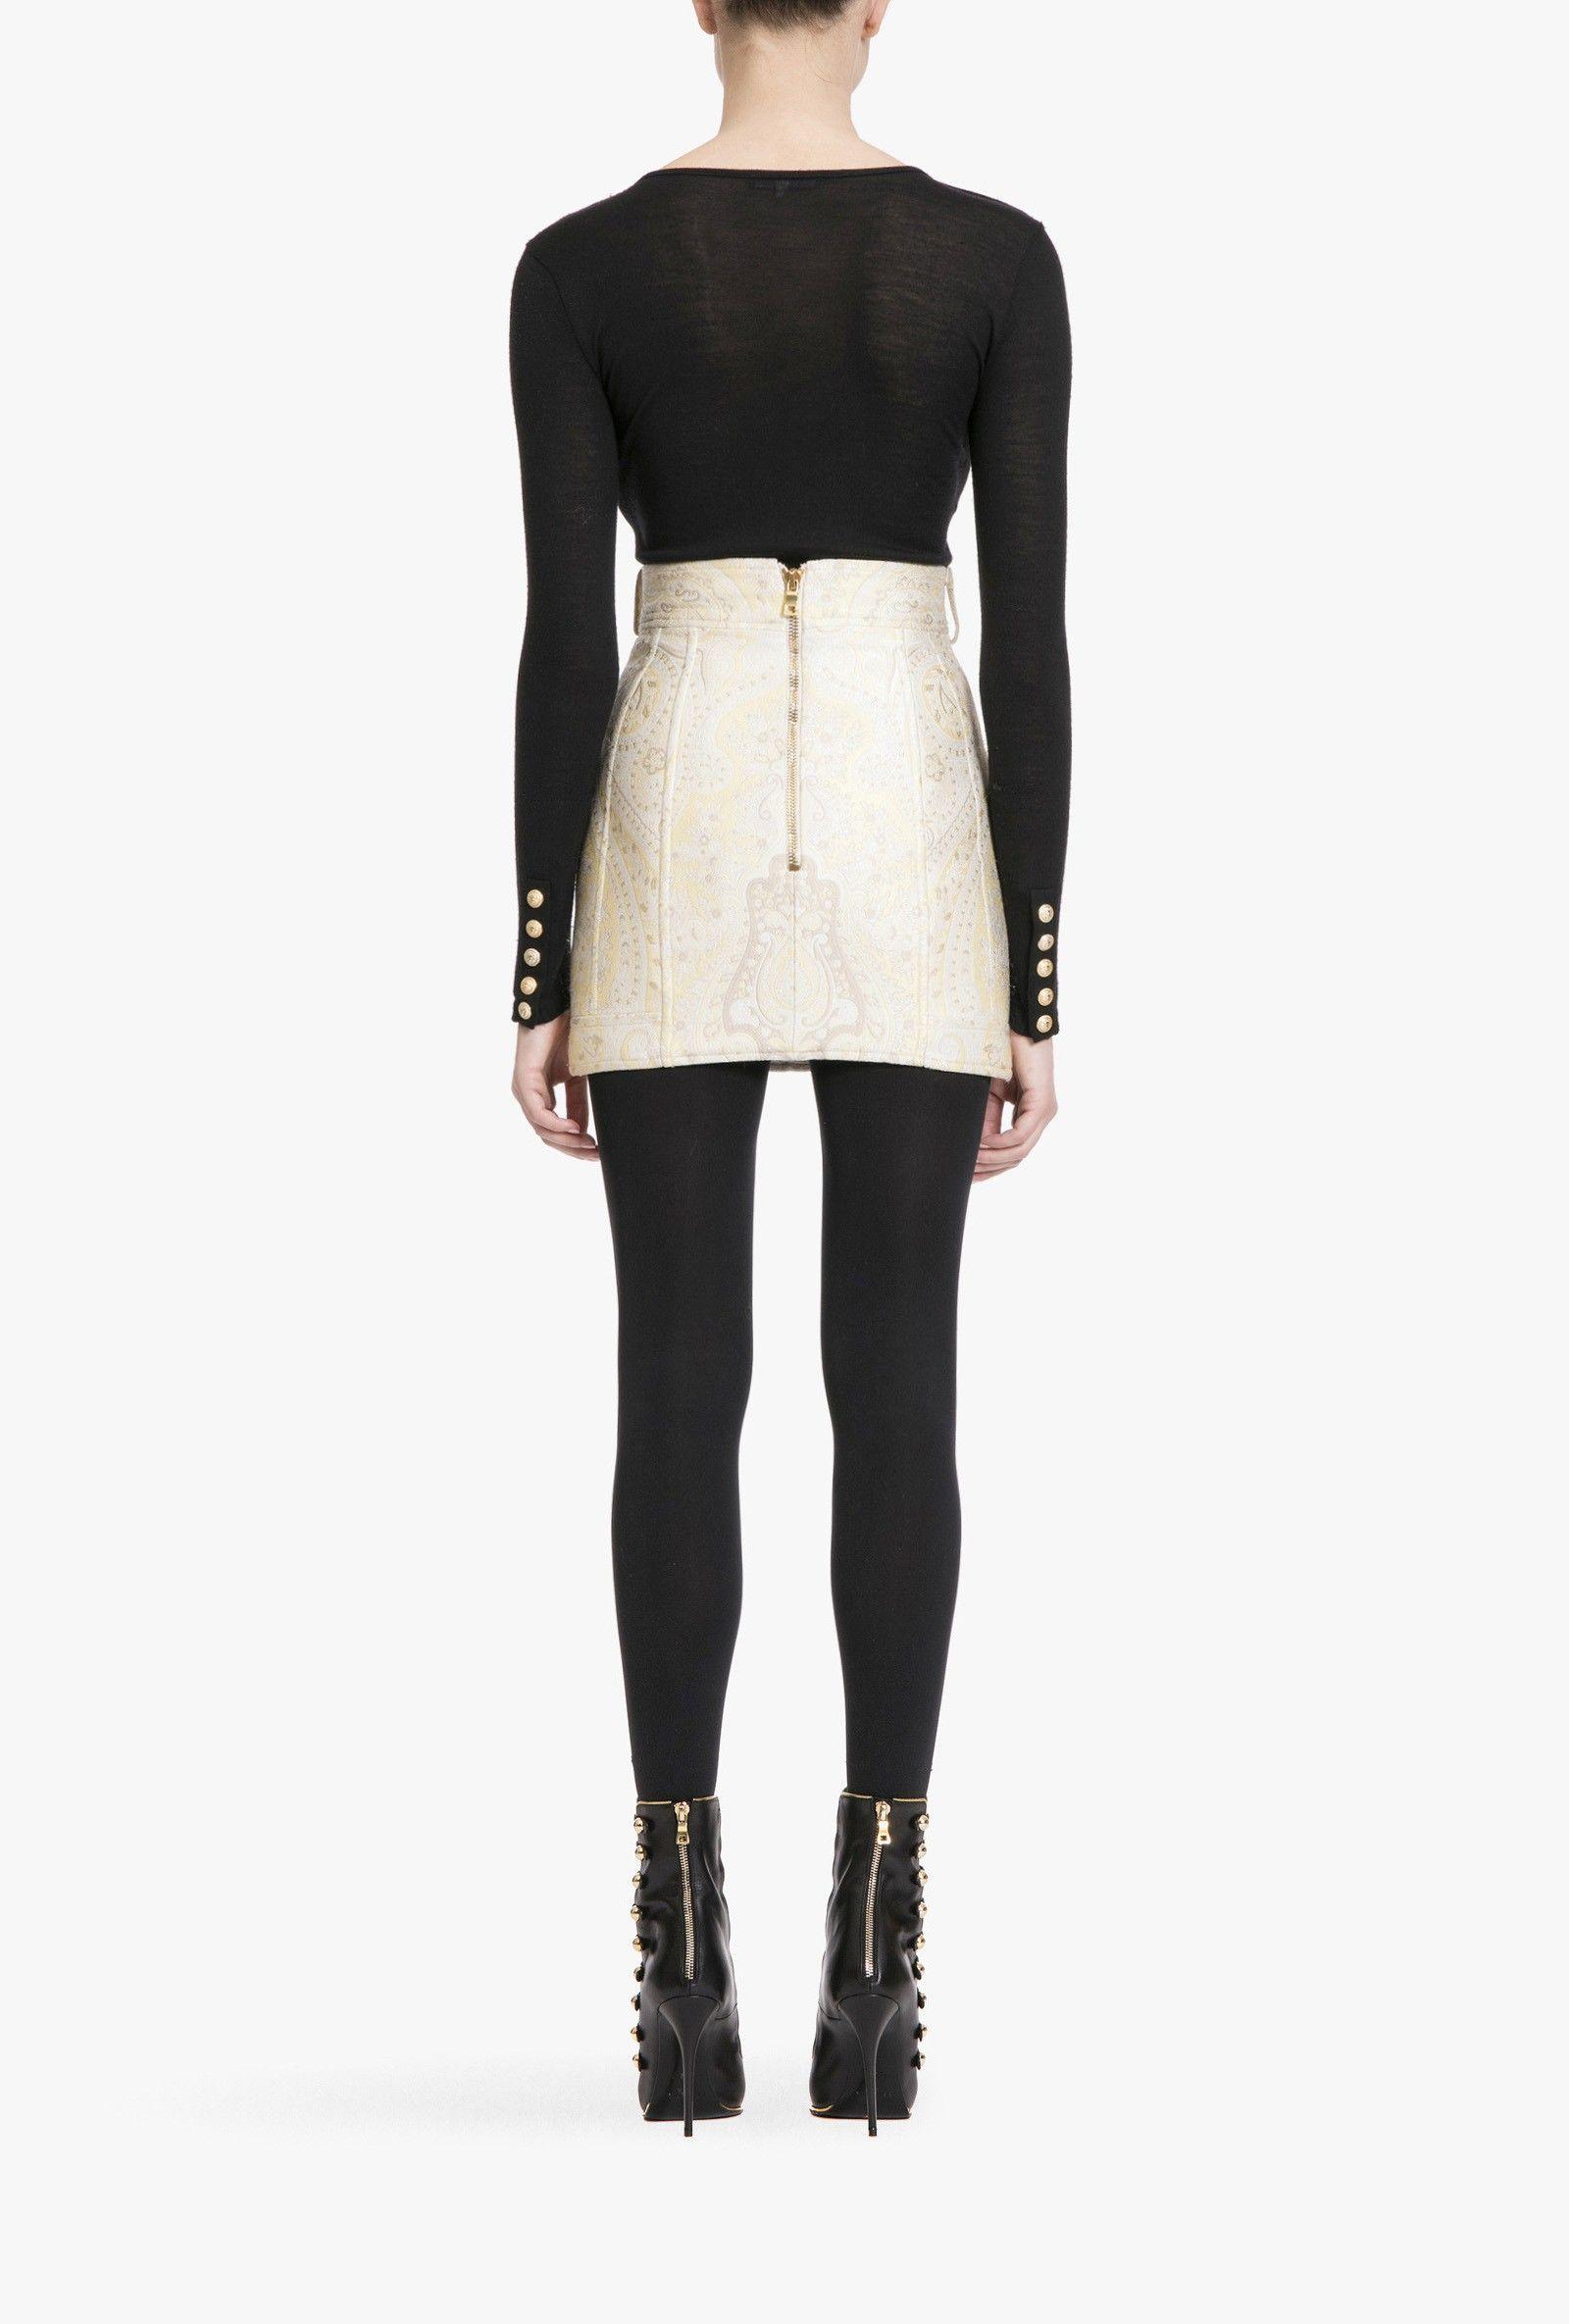 http://www.balmain.com/en_us/women/dresses-and-skirts/button-embellished-jacquard-mini-skirt.html